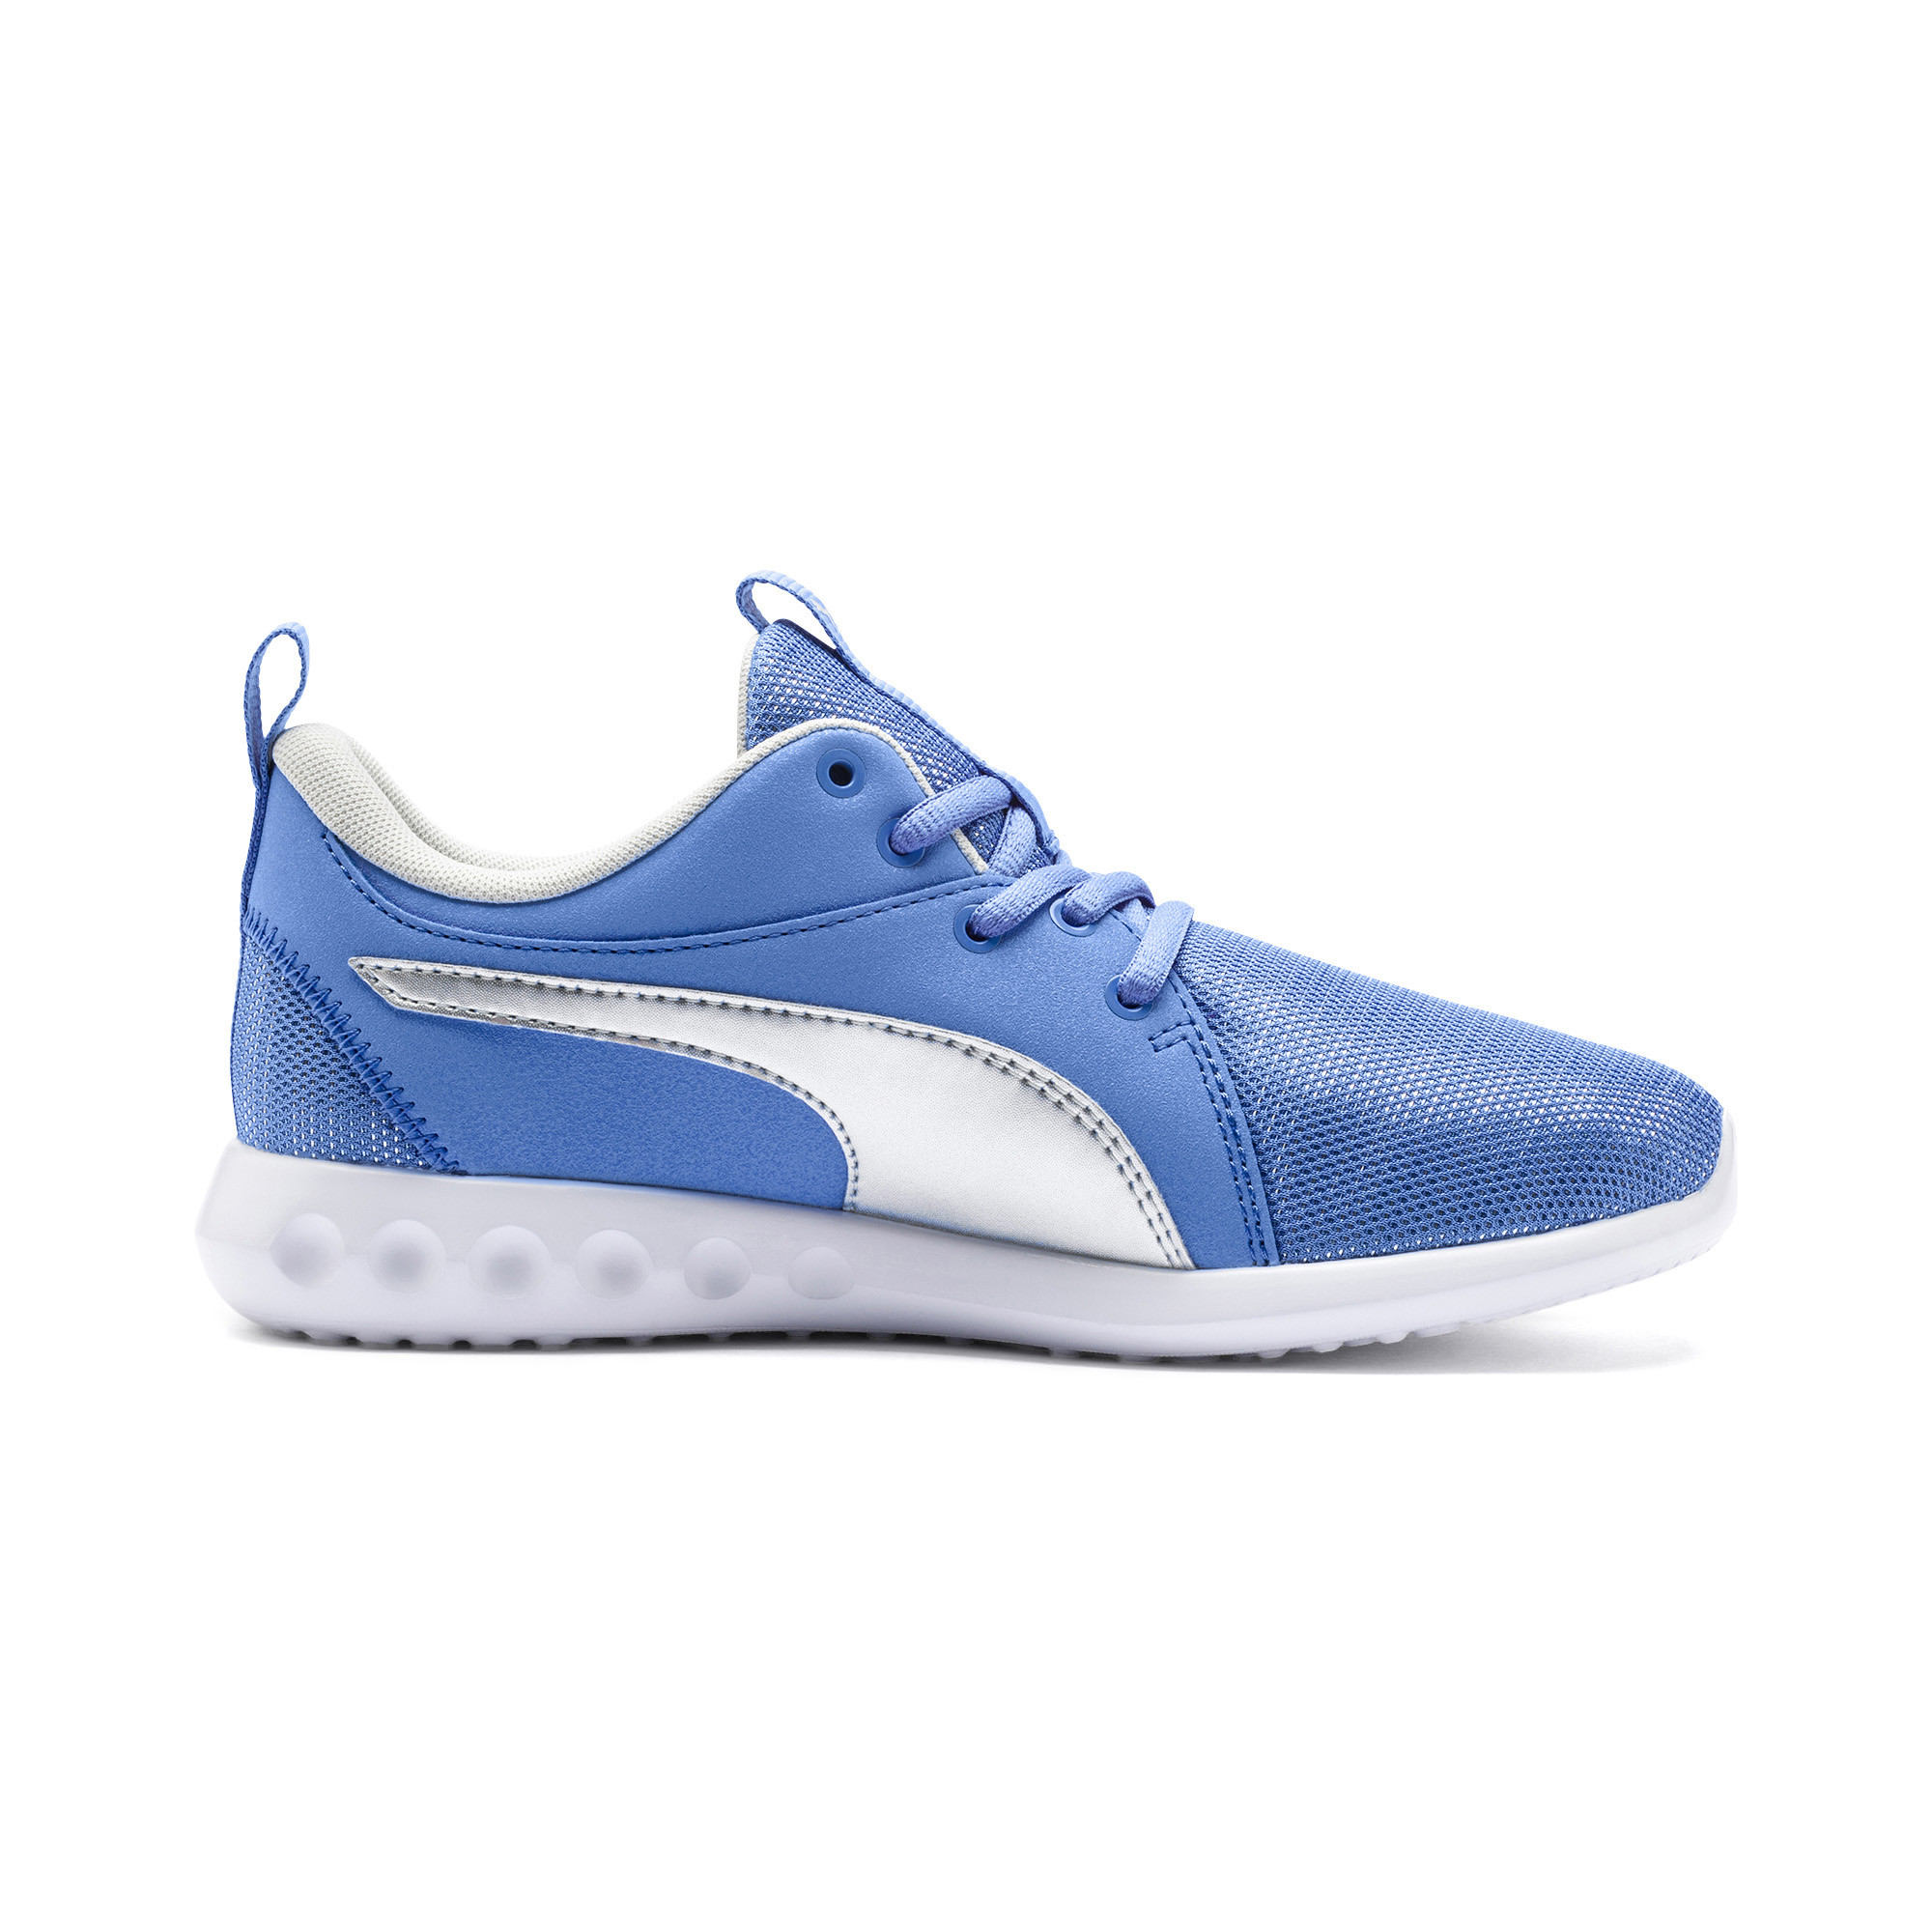 PUMA-Carson-2-Glitz-Shoes-JR-Girls-Shoe-Kids thumbnail 12